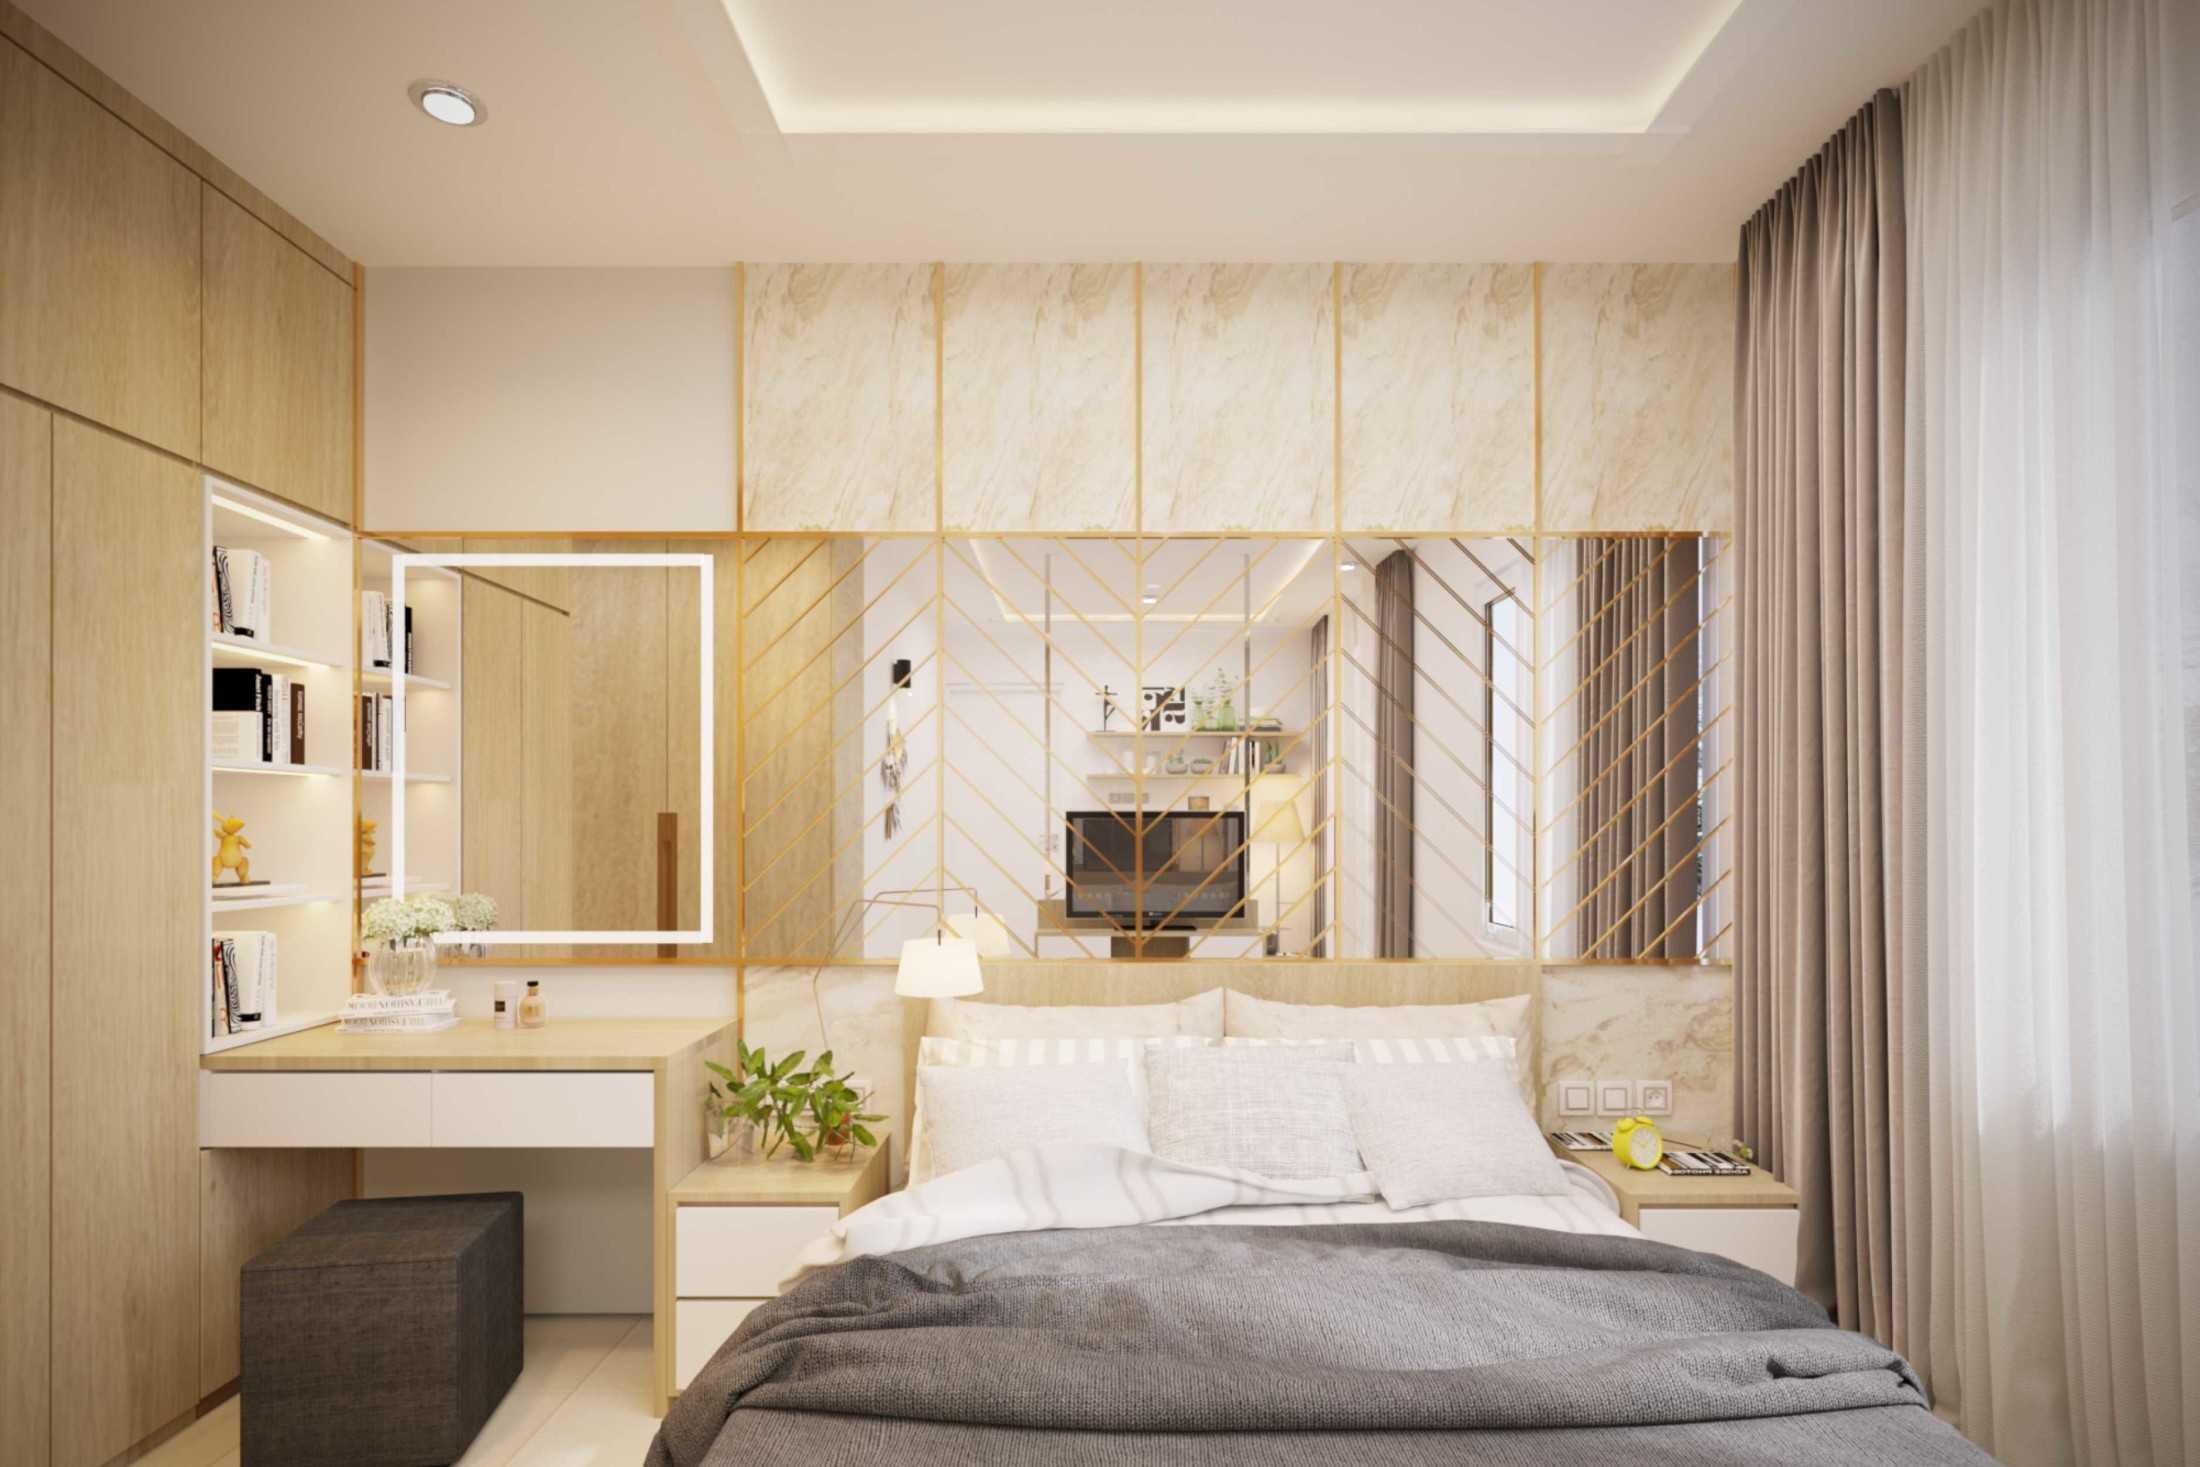 Studio Dinding Michelia 7 House Serpong, Kota Tangerang Selatan, Banten, Indonesia Serpong, Kota Tangerang Selatan, Banten, Indonesia Studio-Dinding-Michelia-7-House  56937